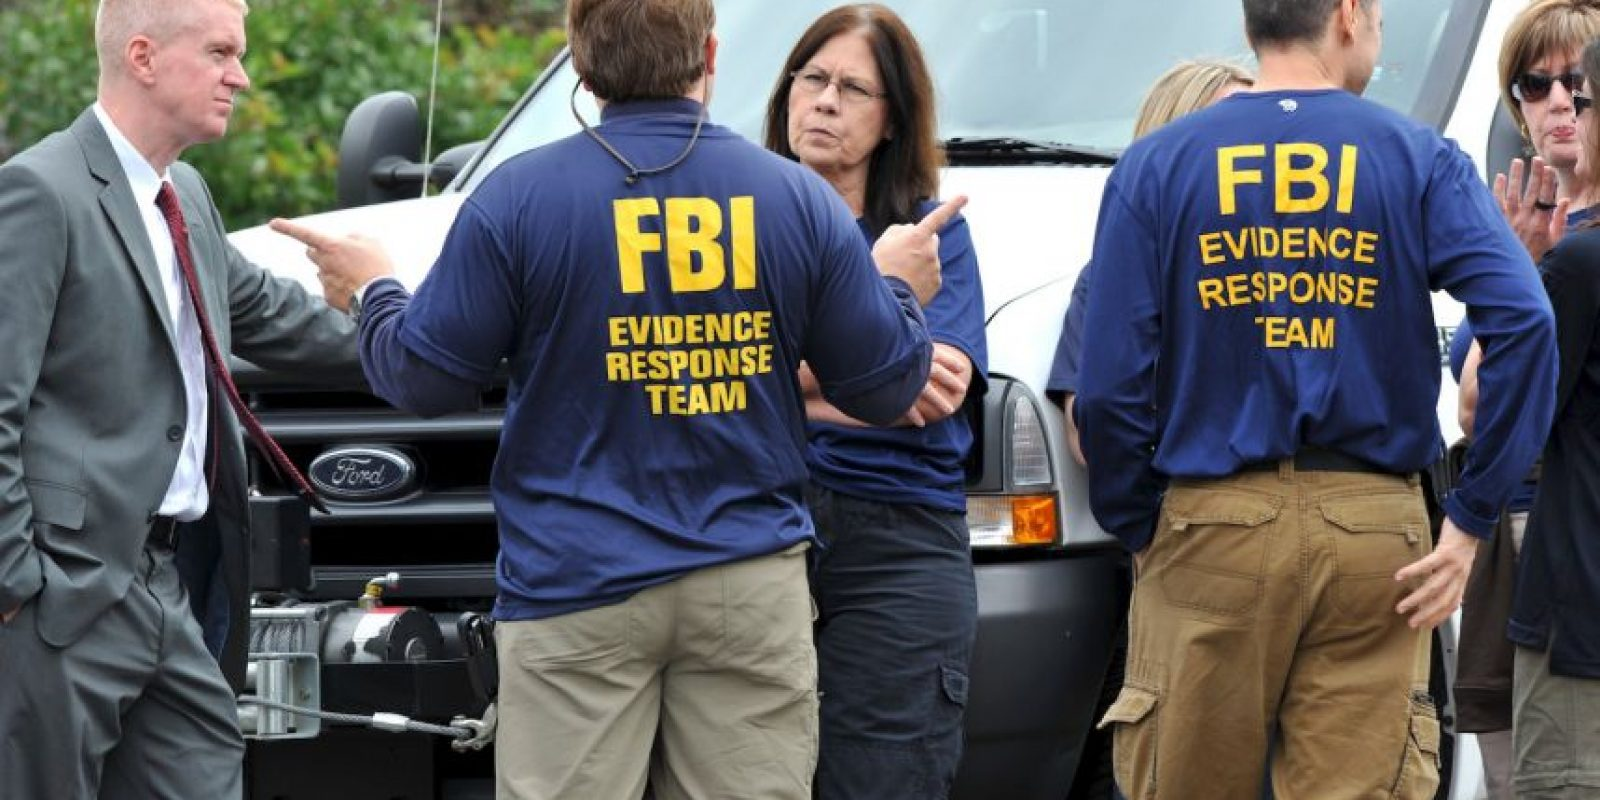 El FBI pudo detener a Harlem Suárez, gracias a un informante Foto:Getty Images